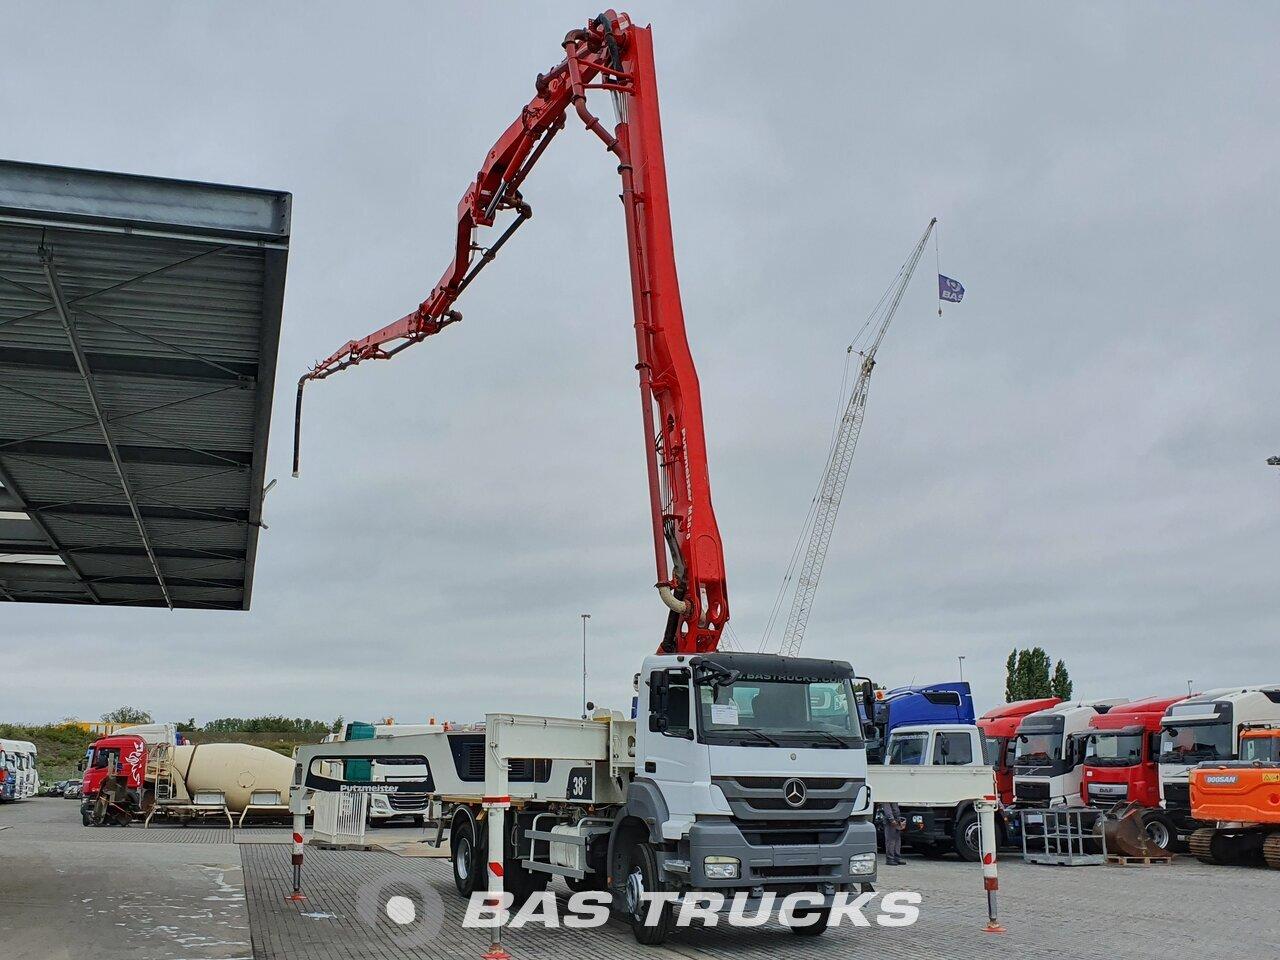 For sale at BAS Trucks: Mercedes Axor 3340 K 6X4 06/2015